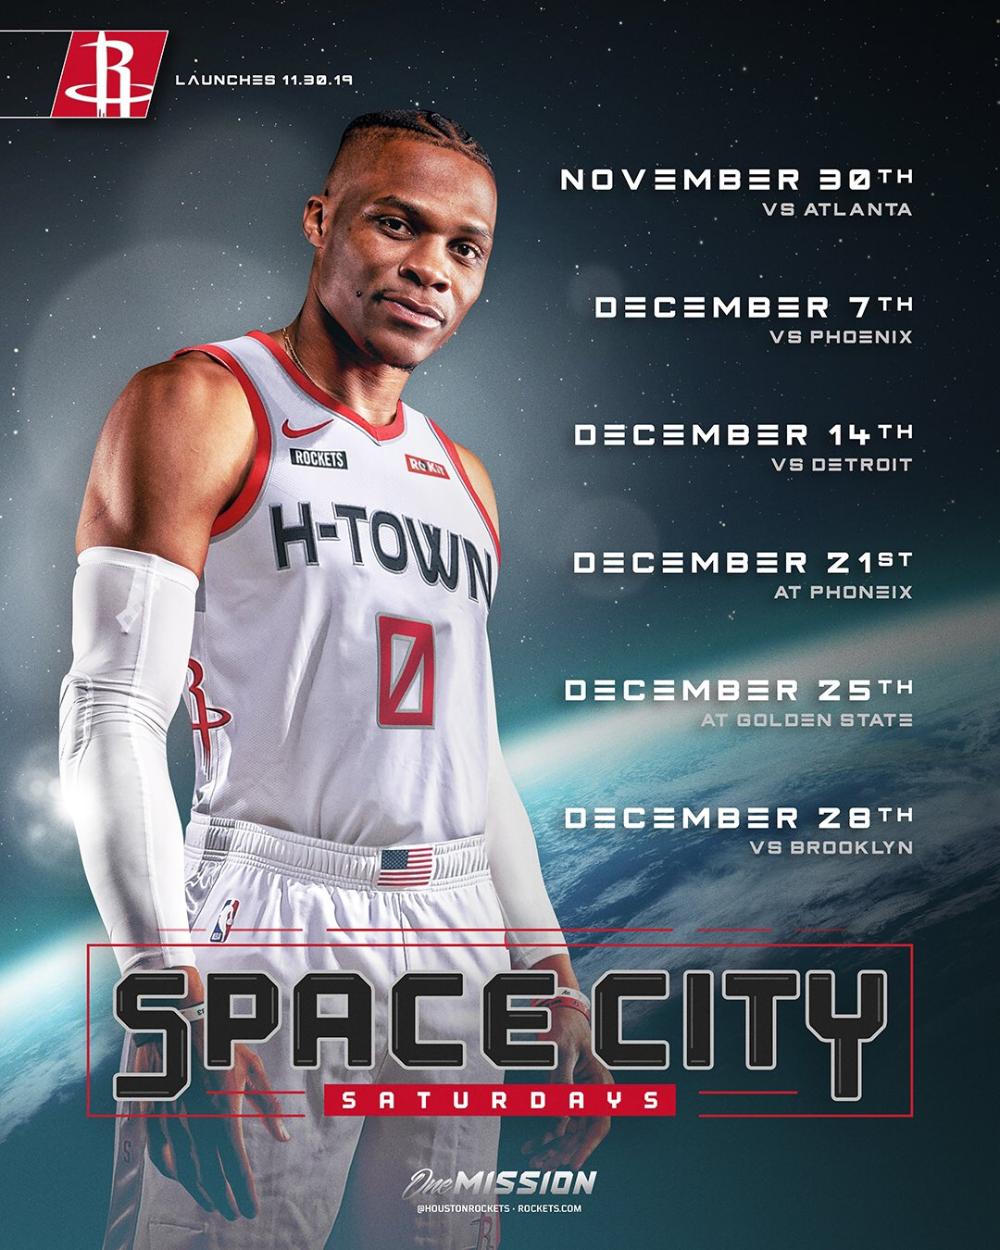 Houston Rockets On Twitter Houston Rockets Rocket Houston Rockets Basketball